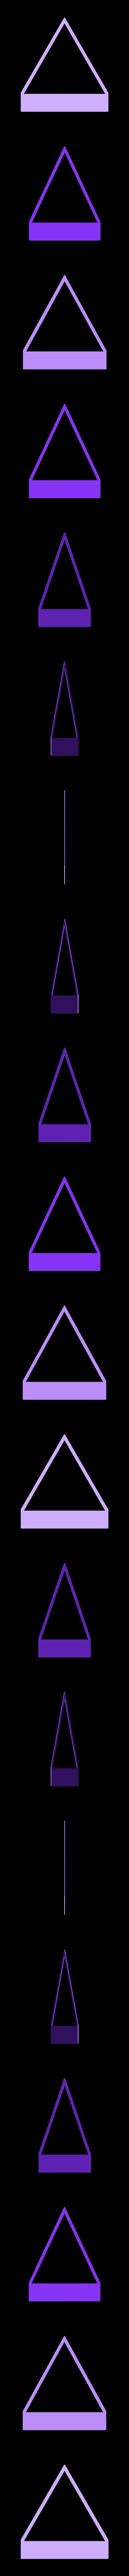 Lulzbot_logo_DE_white_bottom.stl Download free STL file Lulzbot Logo Layered for Single/Dual Extrusion • 3D print template, joshcarter